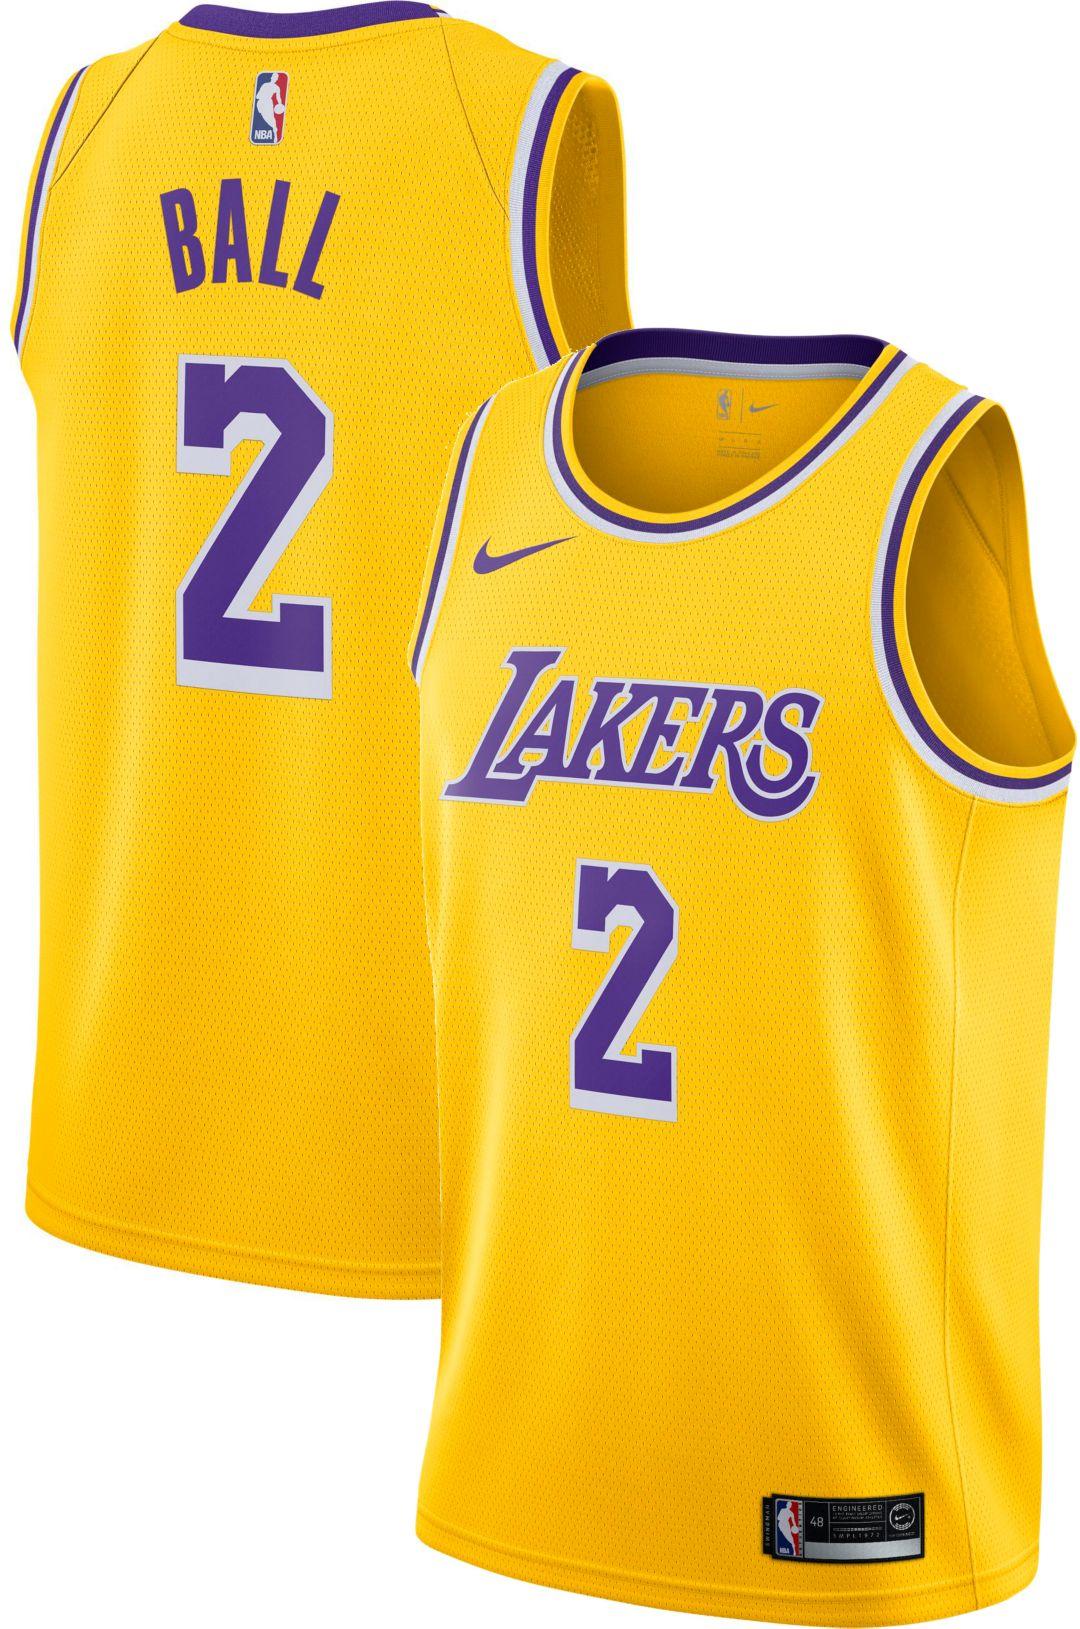 d0497141a33 Nike Men's Los Angeles Lakers Lonzo Ball #2 Gold Dri-FIT Swingman Jersey 1